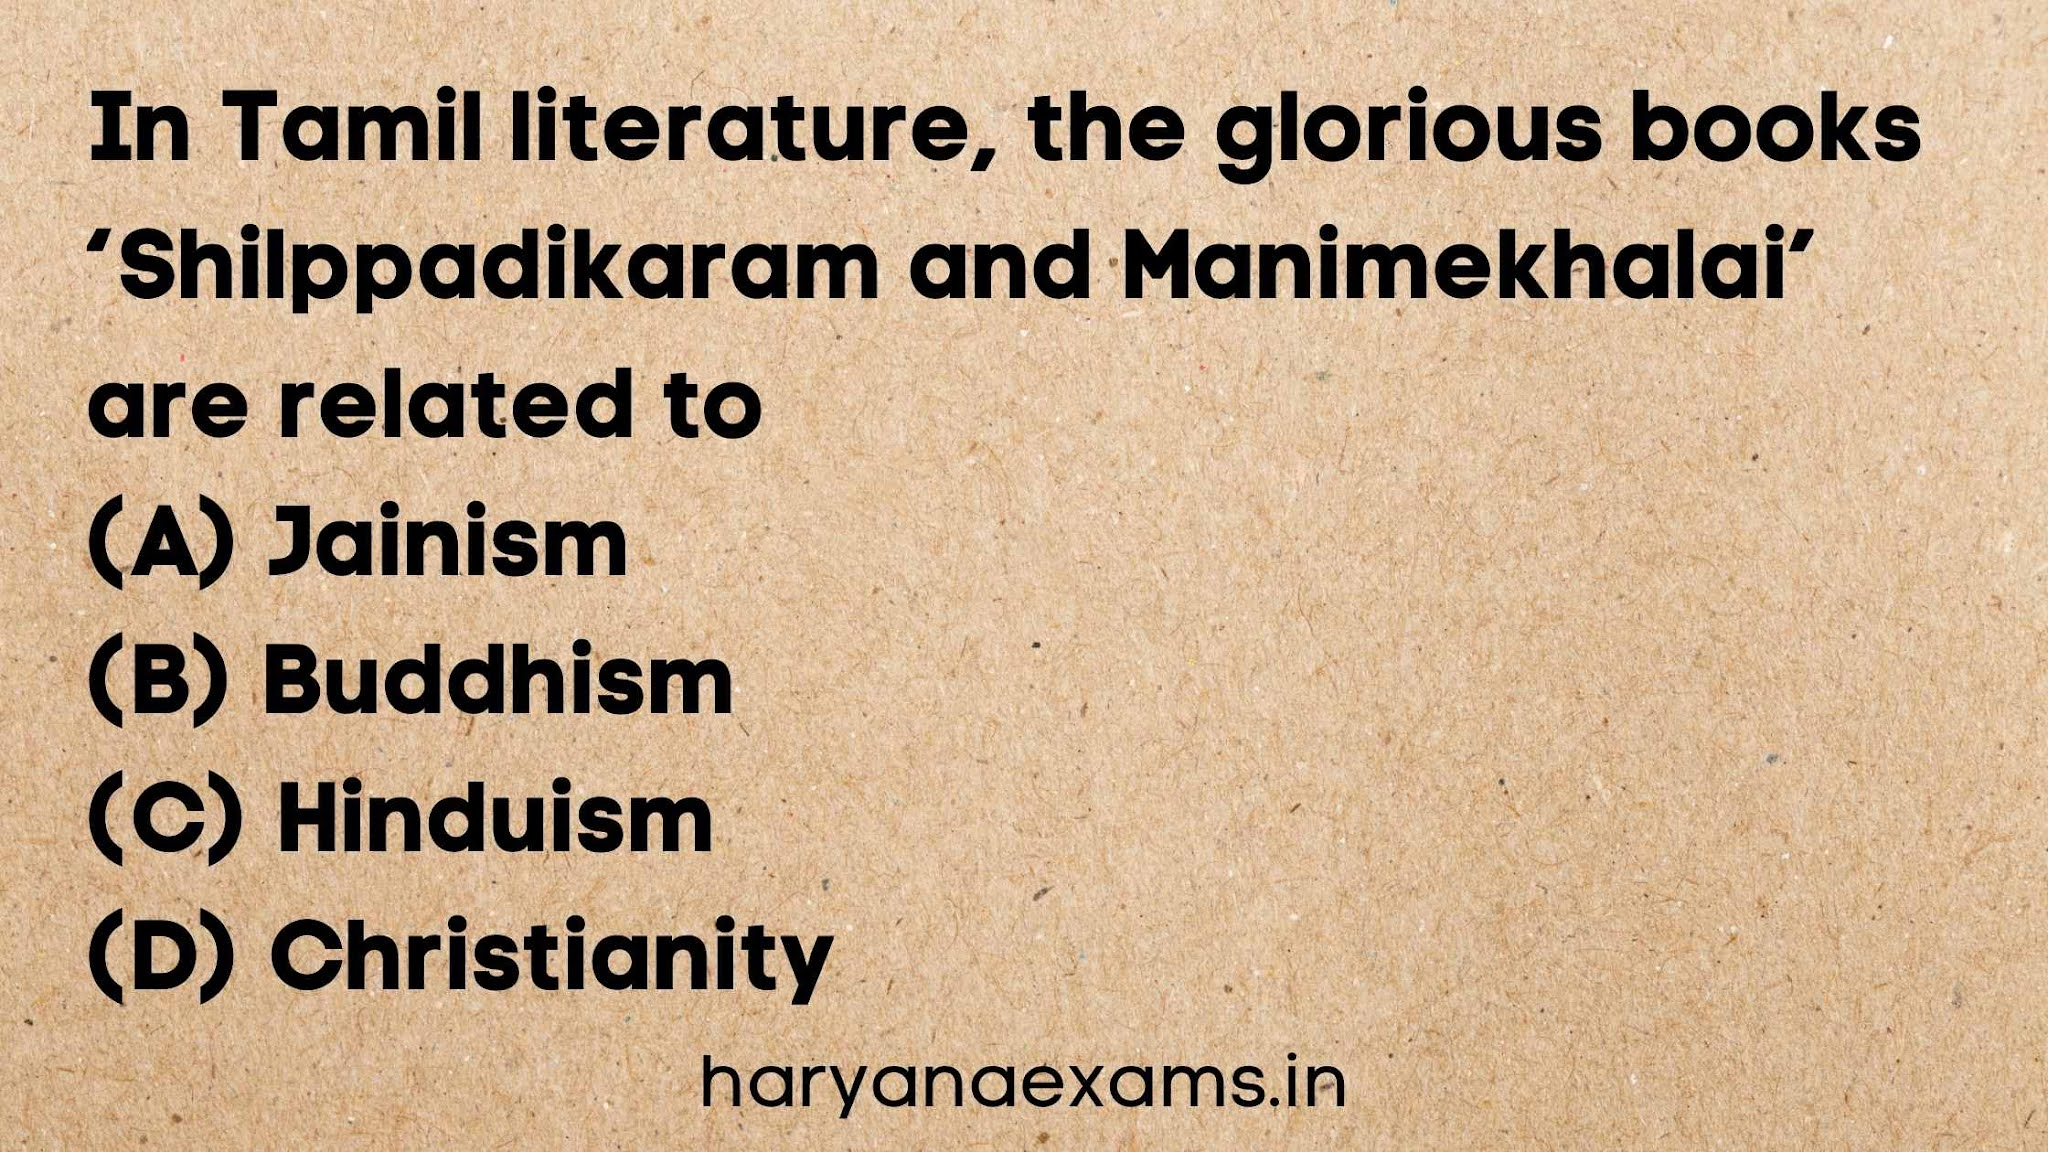 In Tamil literature, the glorious books 'Shilppadikaram and Manimekhalai' are related to   (A) Jainism   (B) Buddhism   (C) Hinduism   (D) Christianity